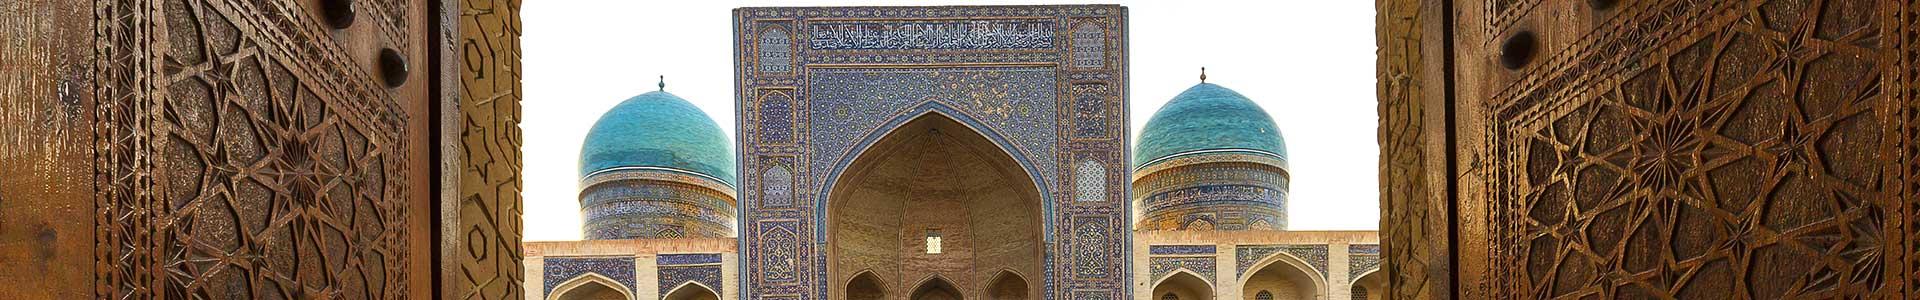 Voyage en Ouzbékistan - TUI